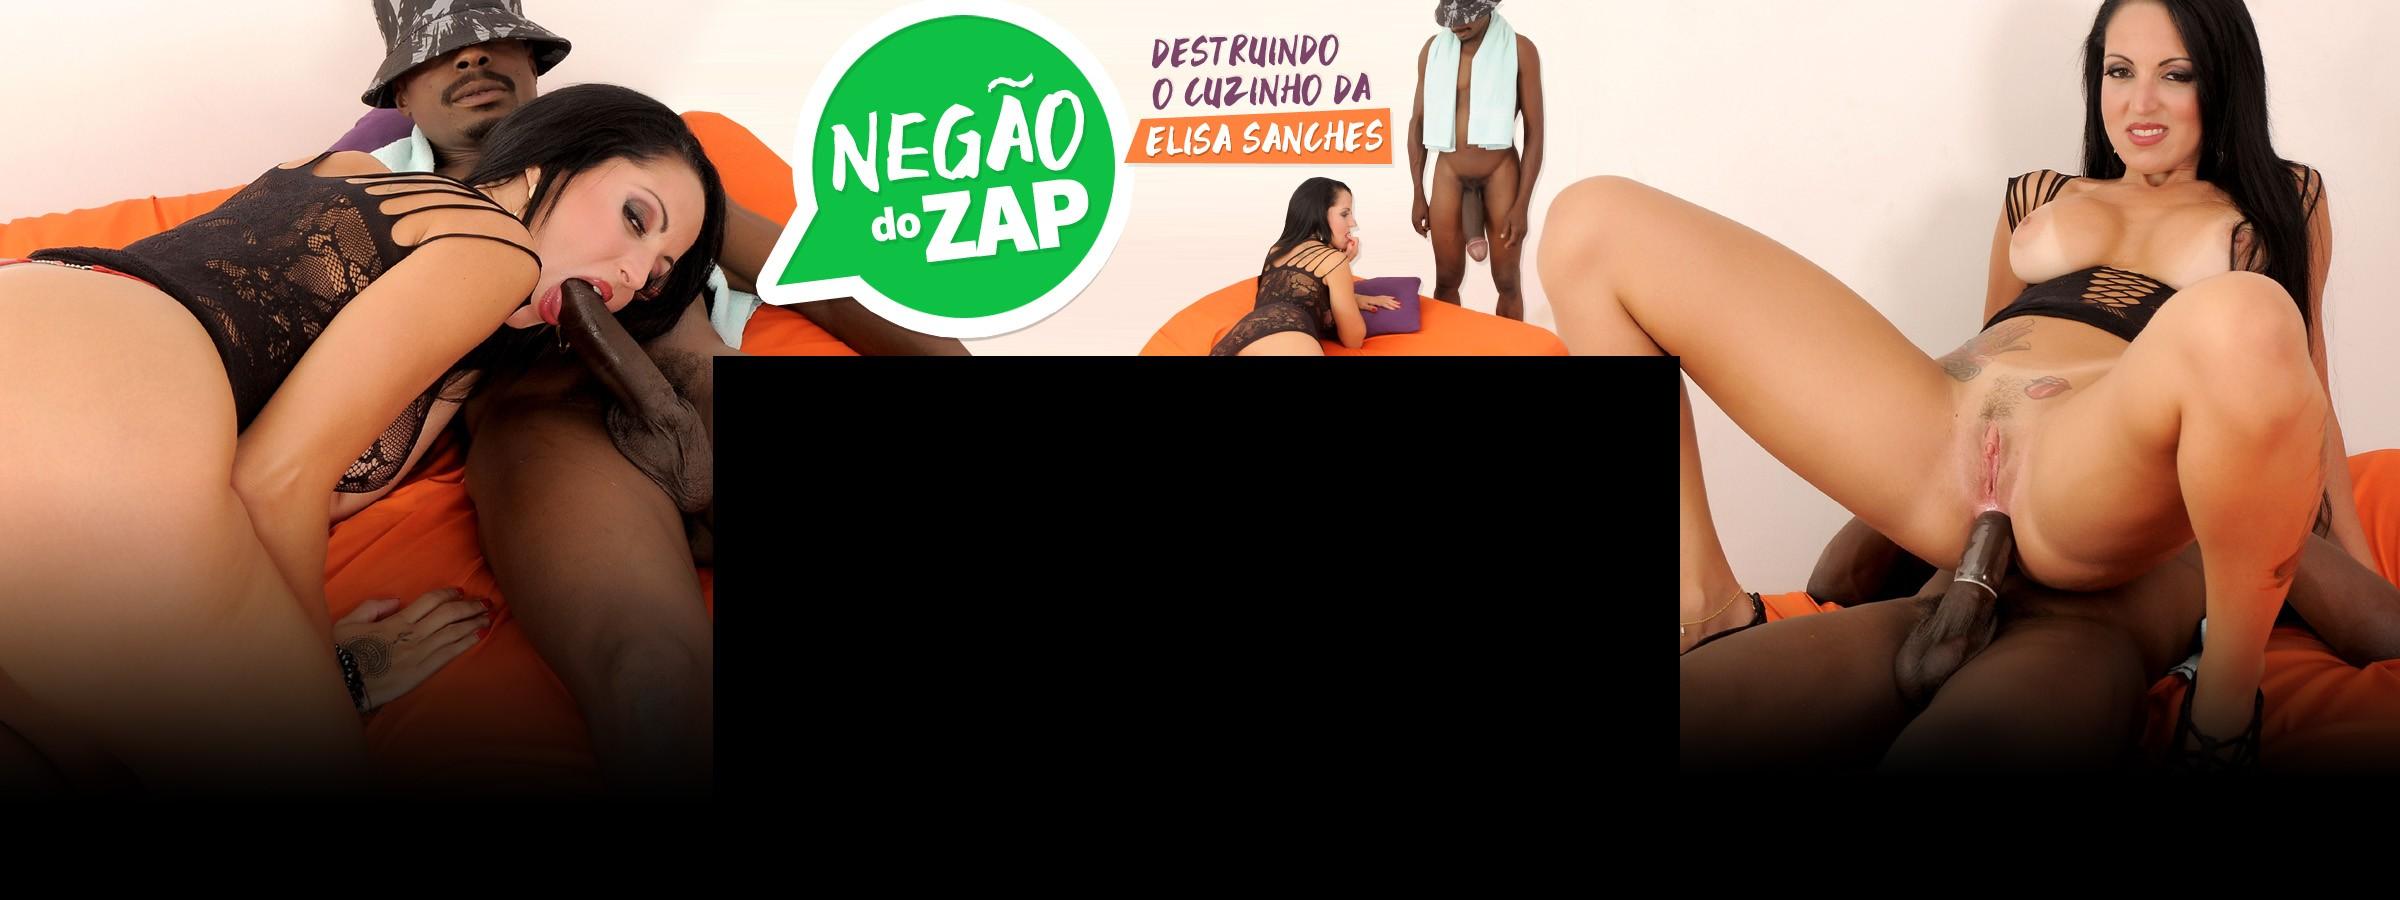 Elisa Negão Zap